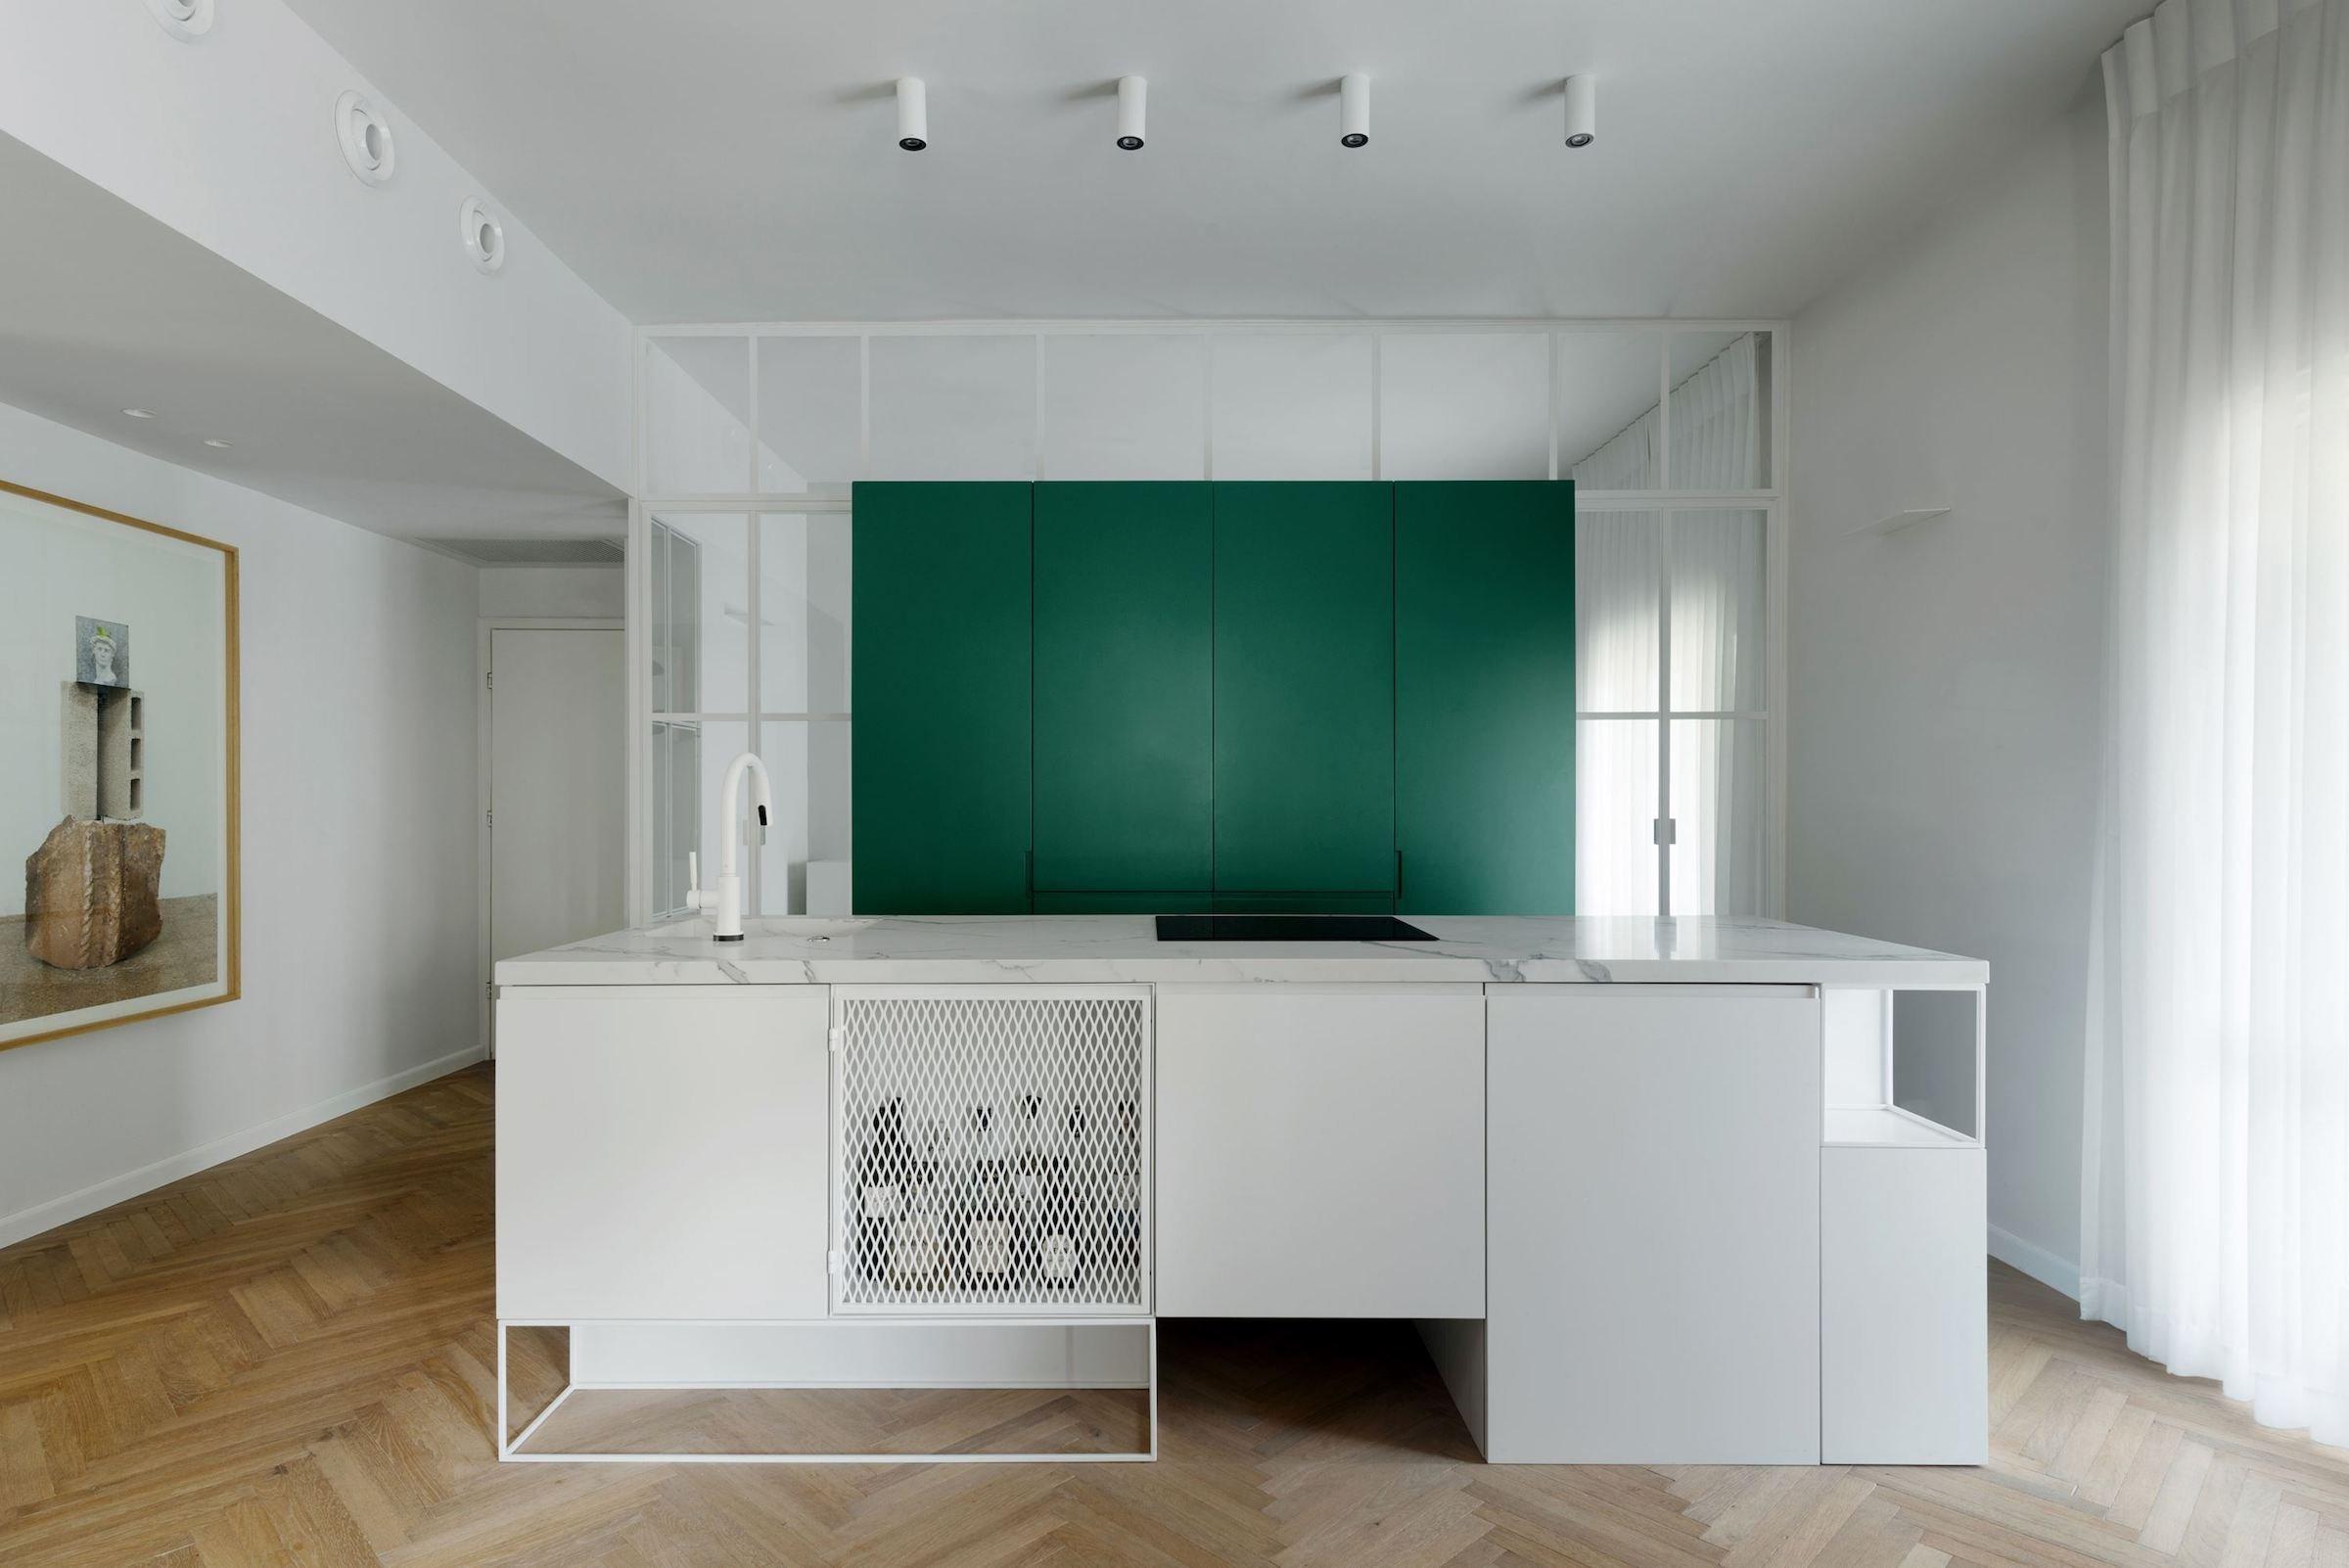 Jak barvy oživí interiér